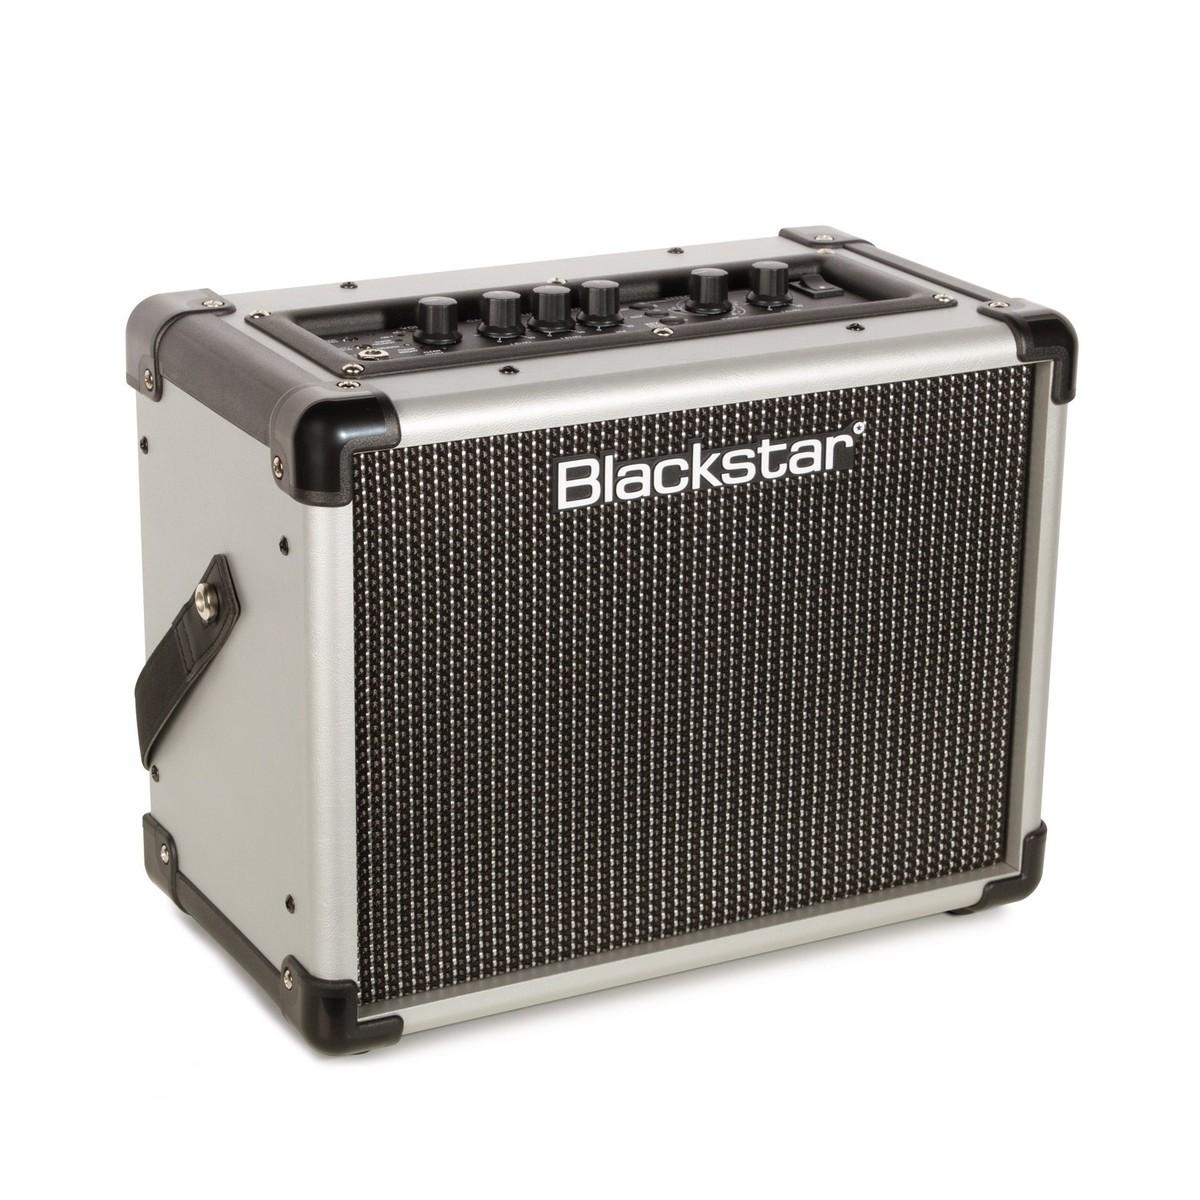 blackstar id core 10 stereo version 2 10 watt combo amp silver at. Black Bedroom Furniture Sets. Home Design Ideas